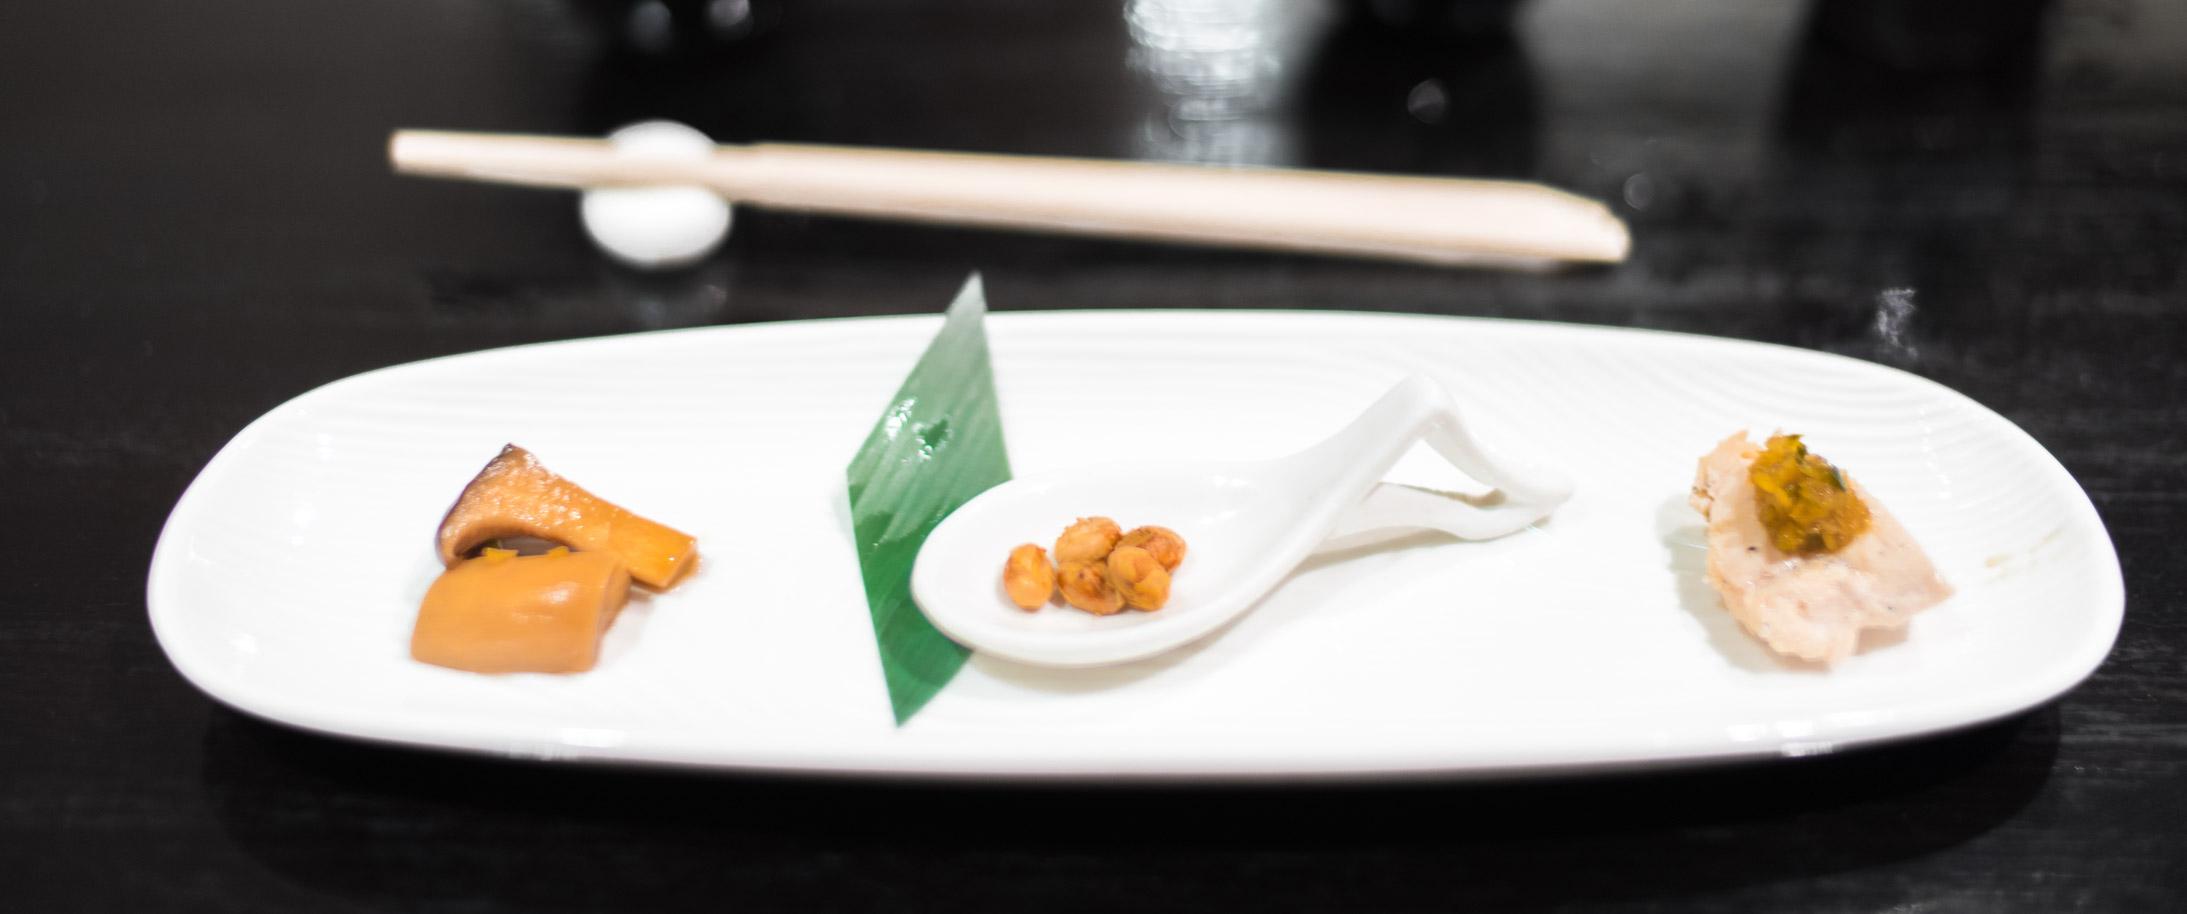 Amuse Bouche  - Mushroom with sweet soy and ginger, garlic oil chicken tenderloin, Sasabune-festival inspired soybeans